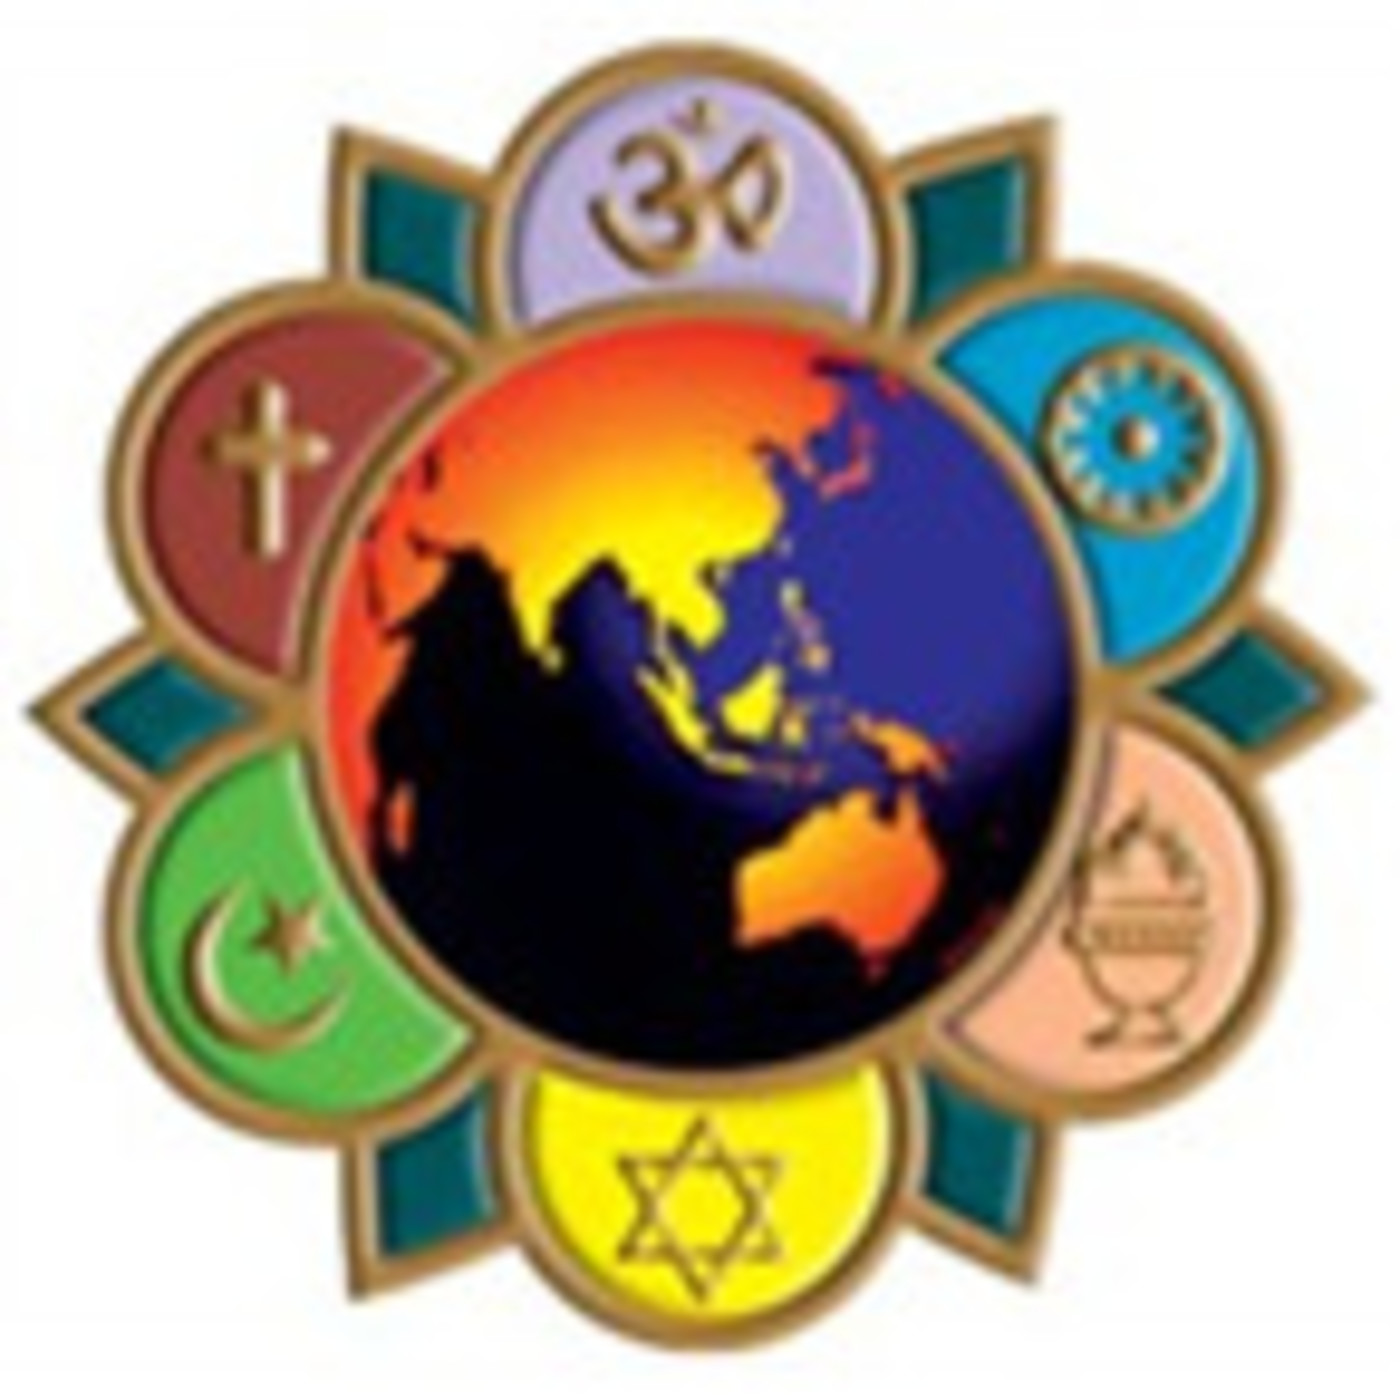 Radio Sai Global Harmony - Bhajan